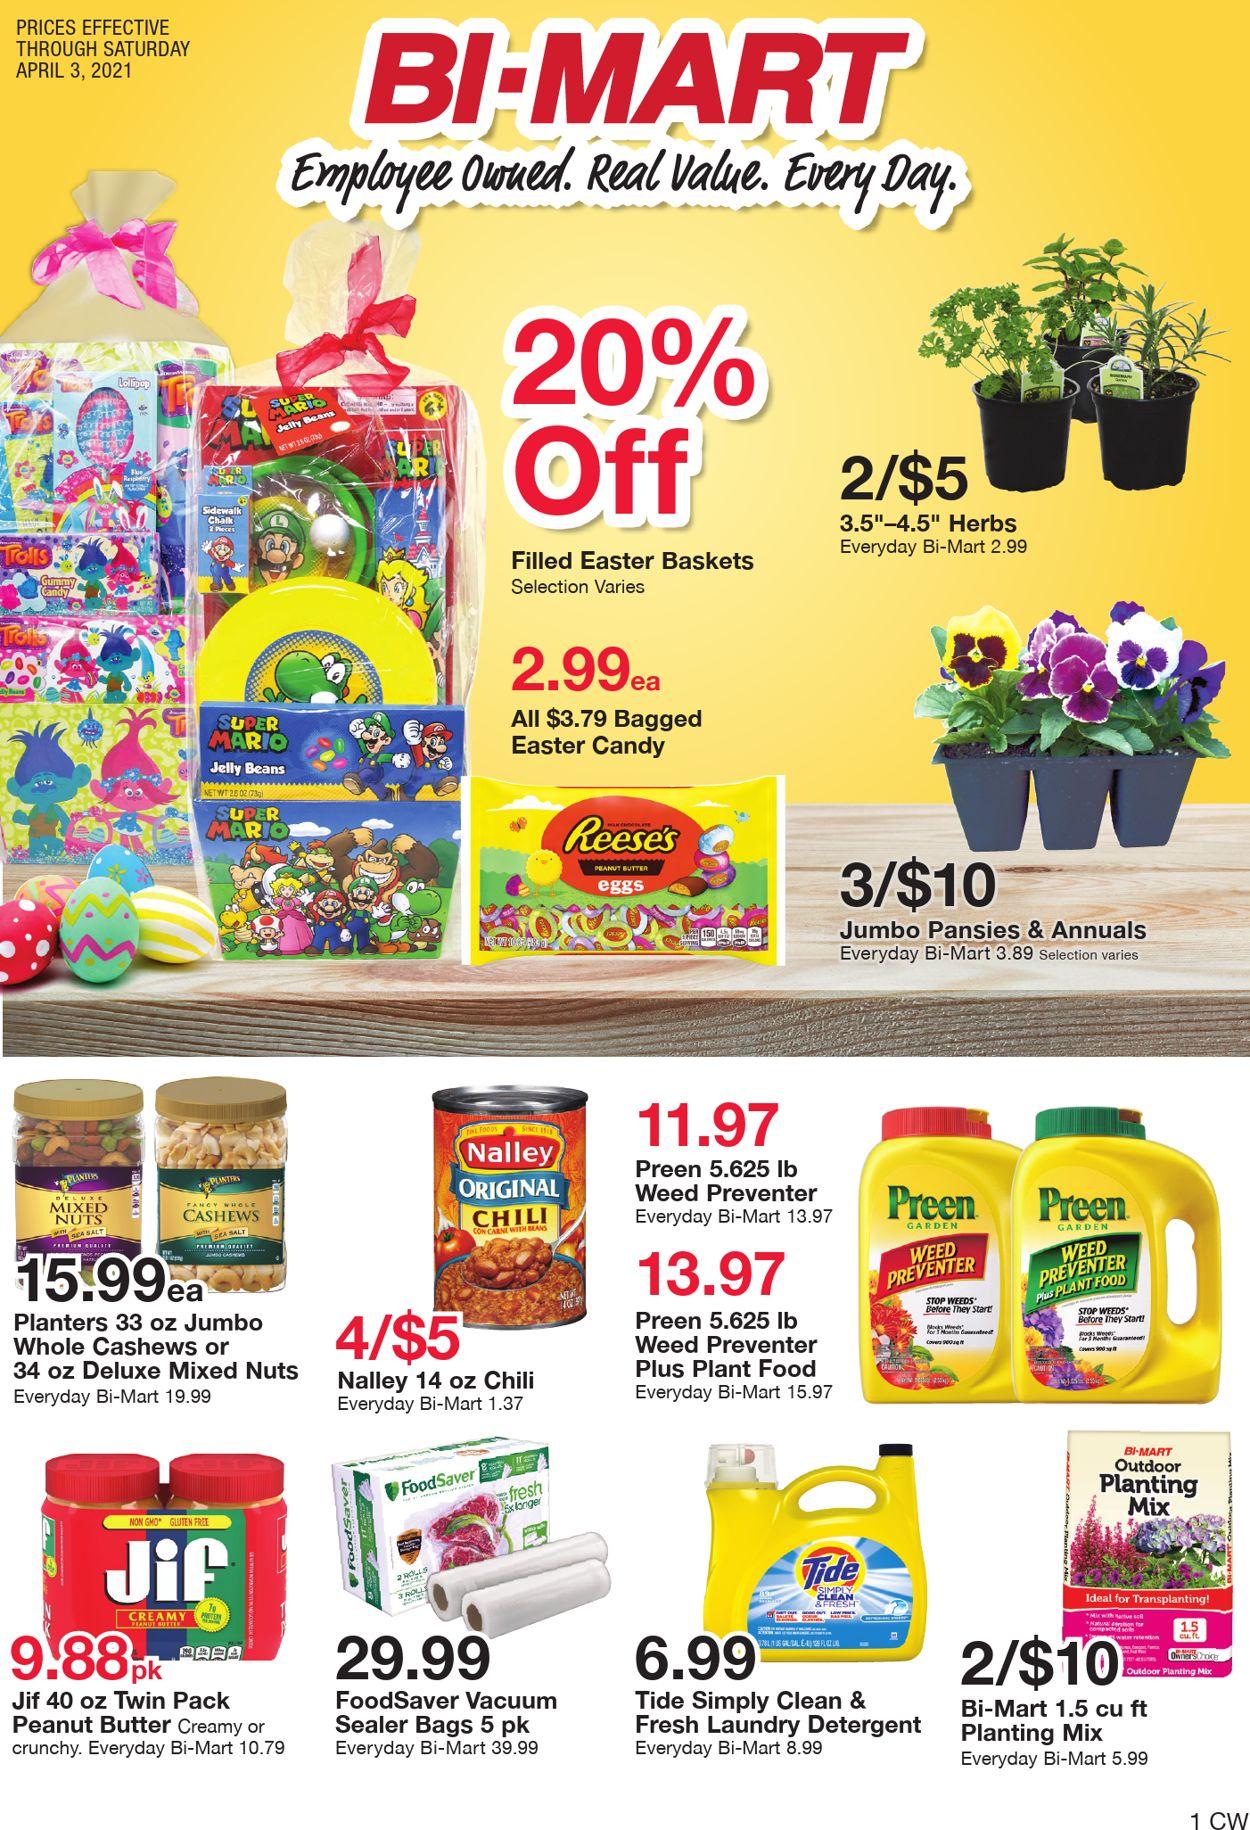 Bi-Mart - Easter 2021 Weekly Ad Circular - valid 03/23-04/03/2021